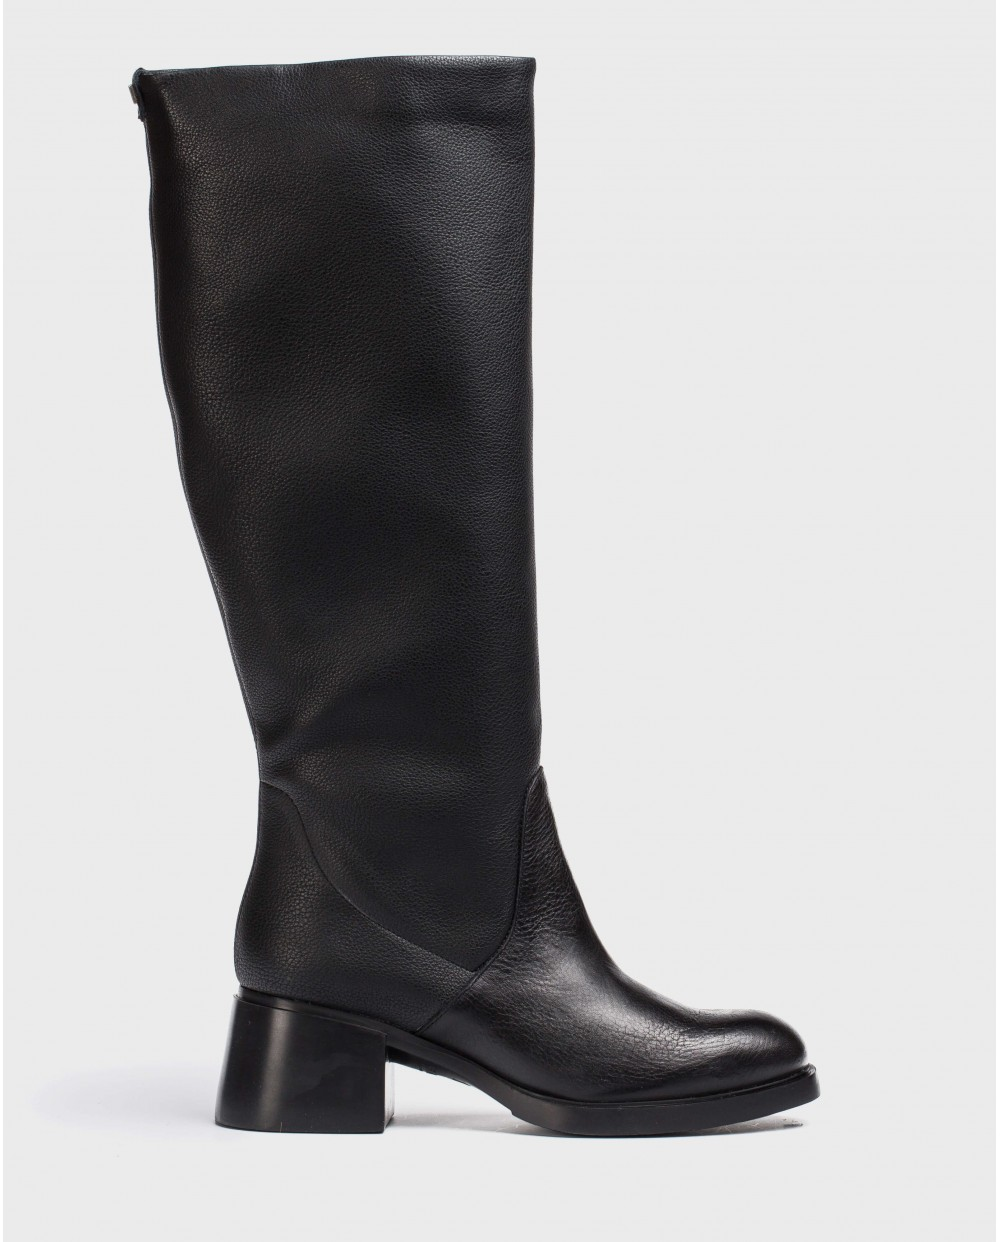 Black L.A Boot